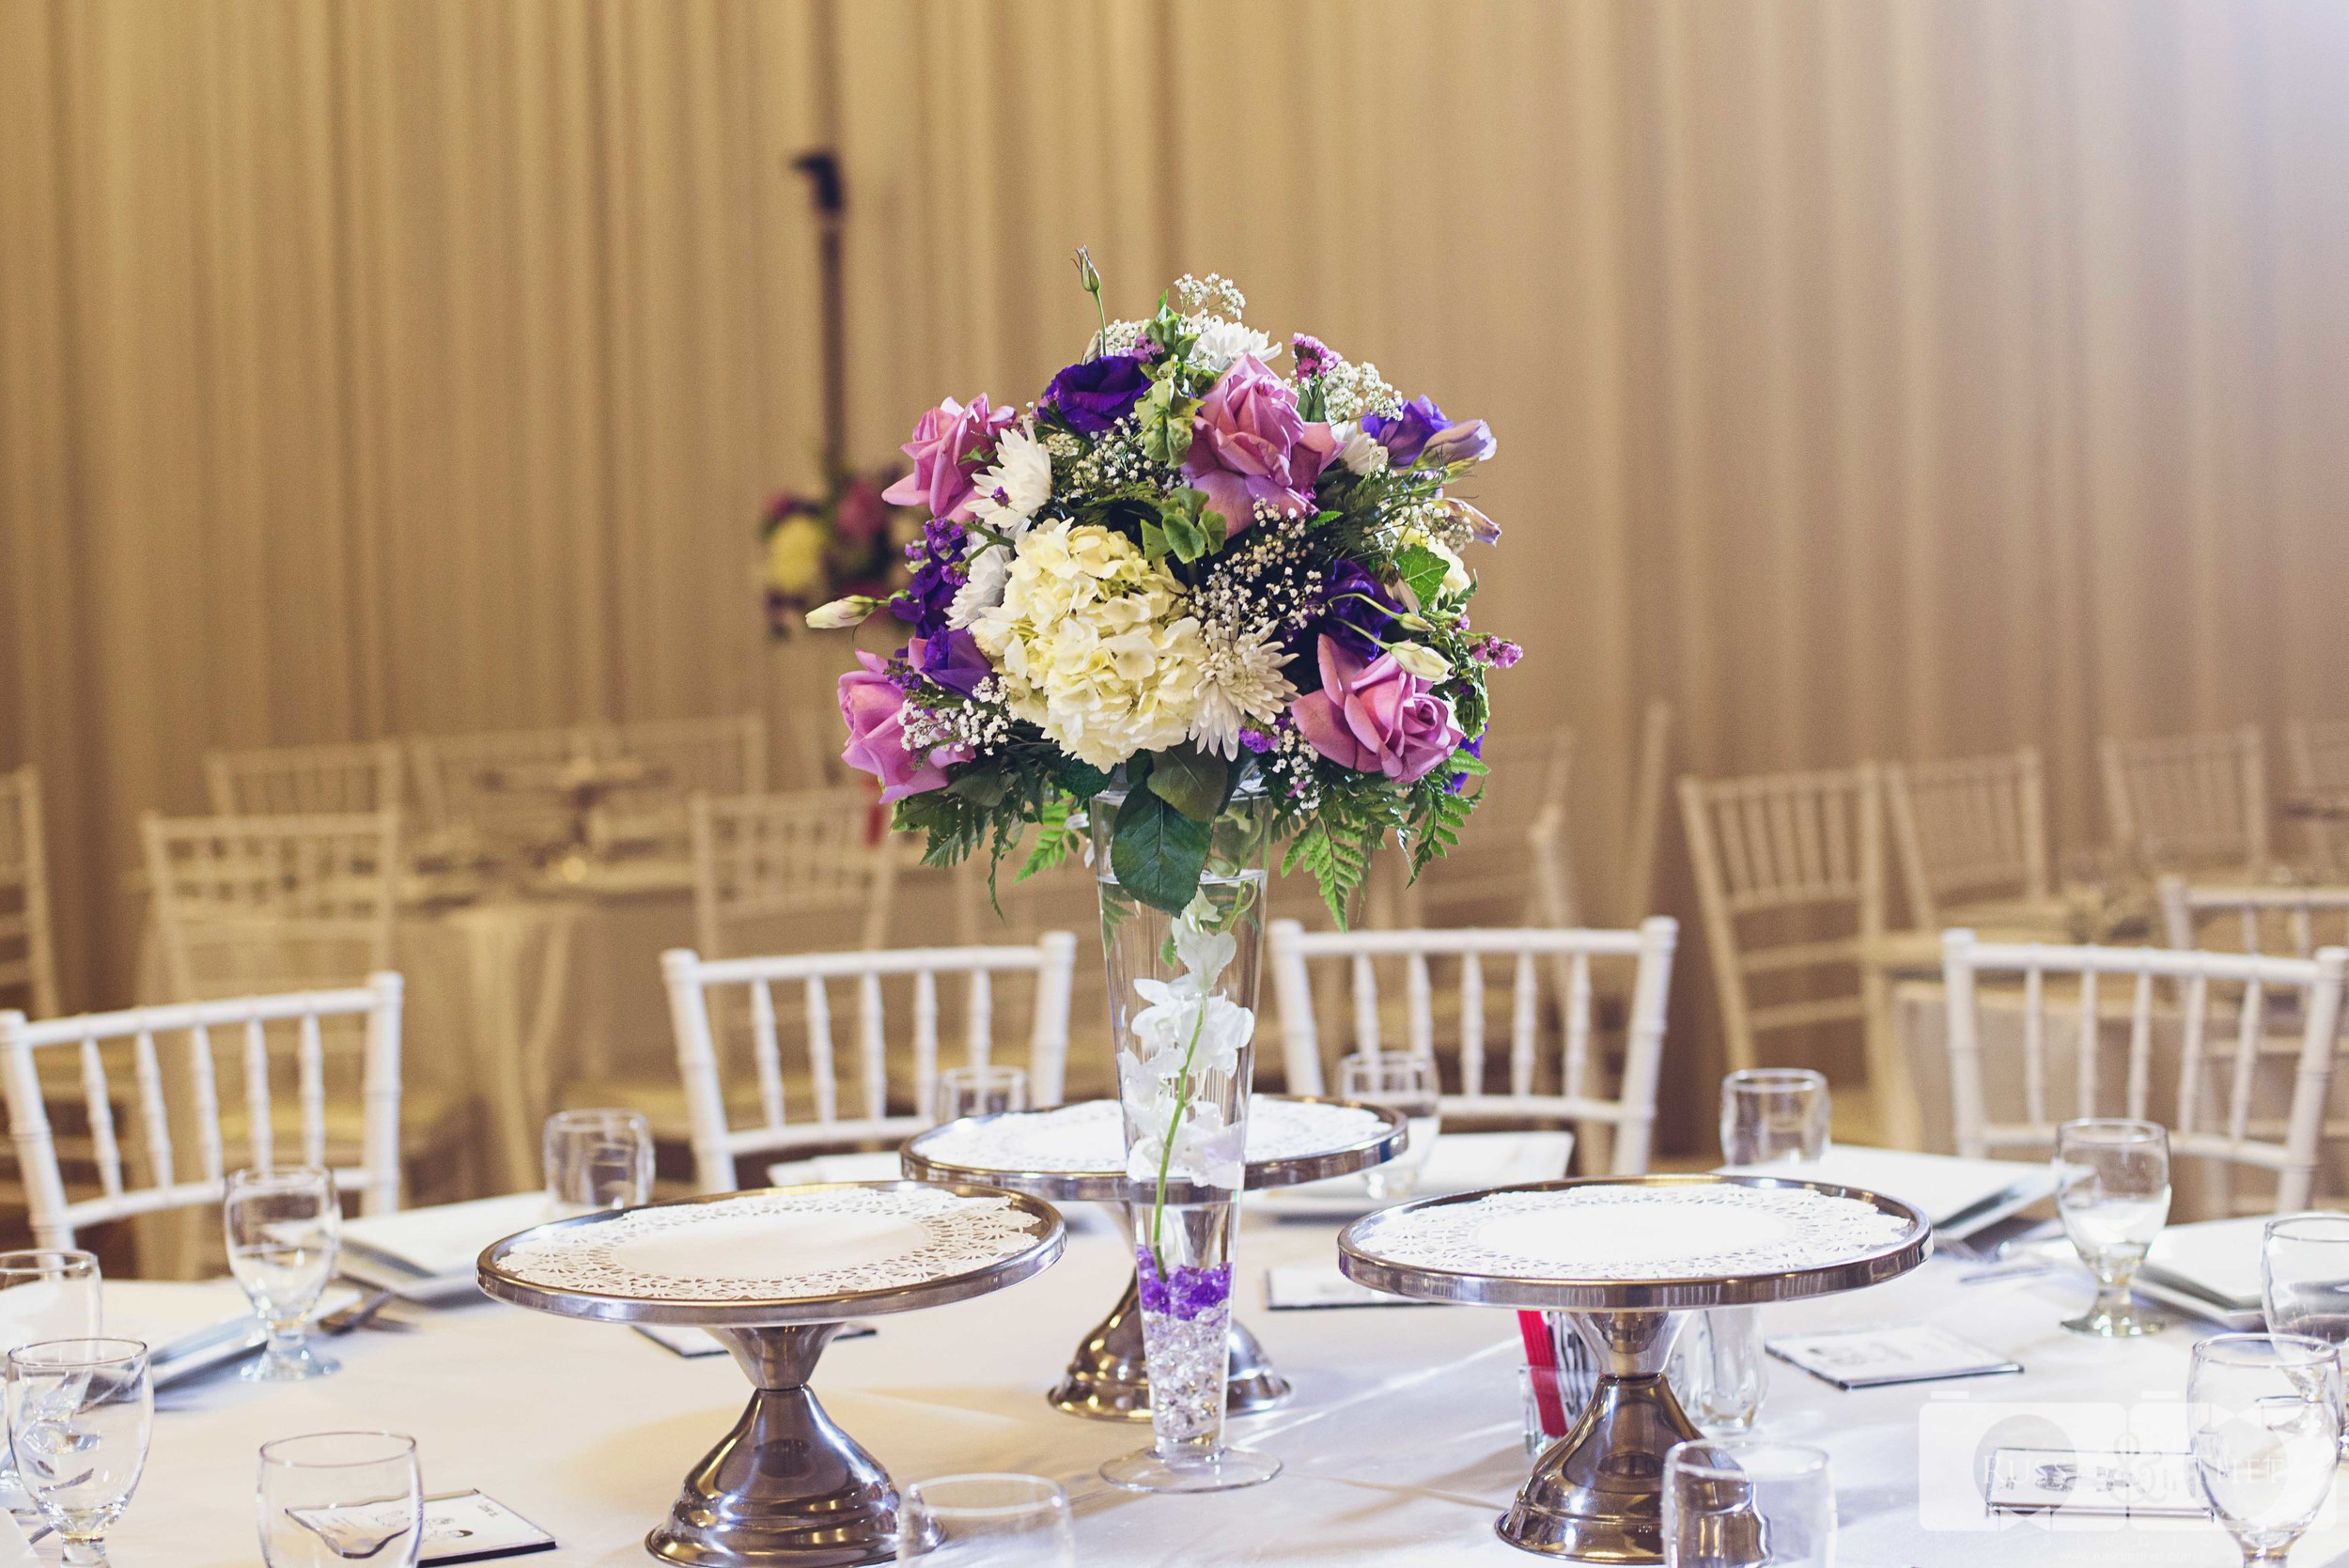 royal-palace-banquet-hall-glendale-wedding-14.JPG